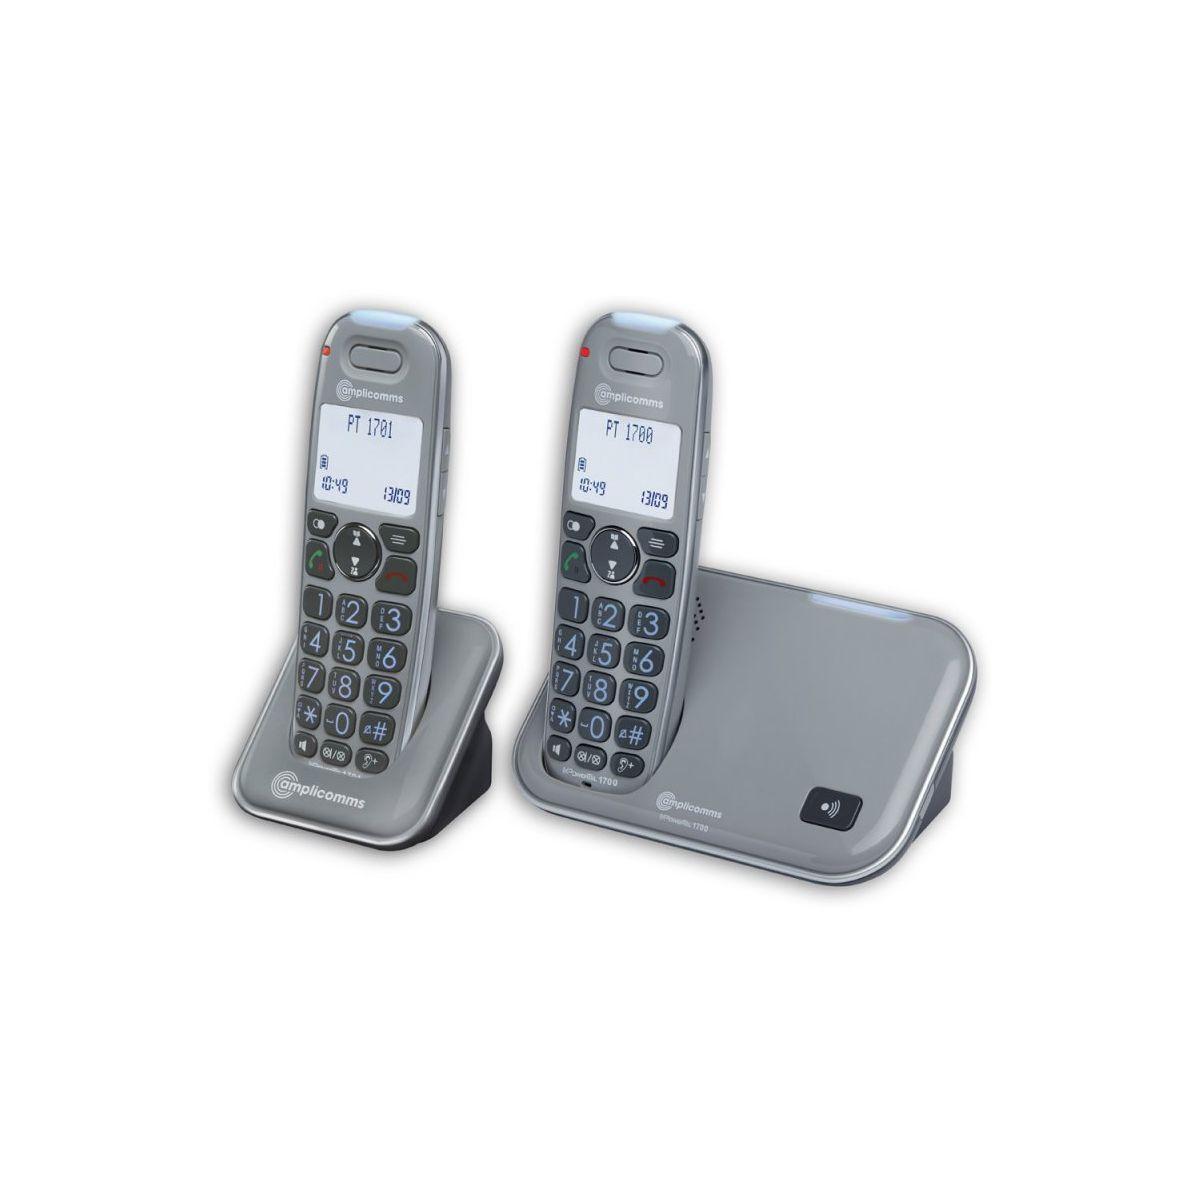 Pack amplicomms powertel 1702 (photo)